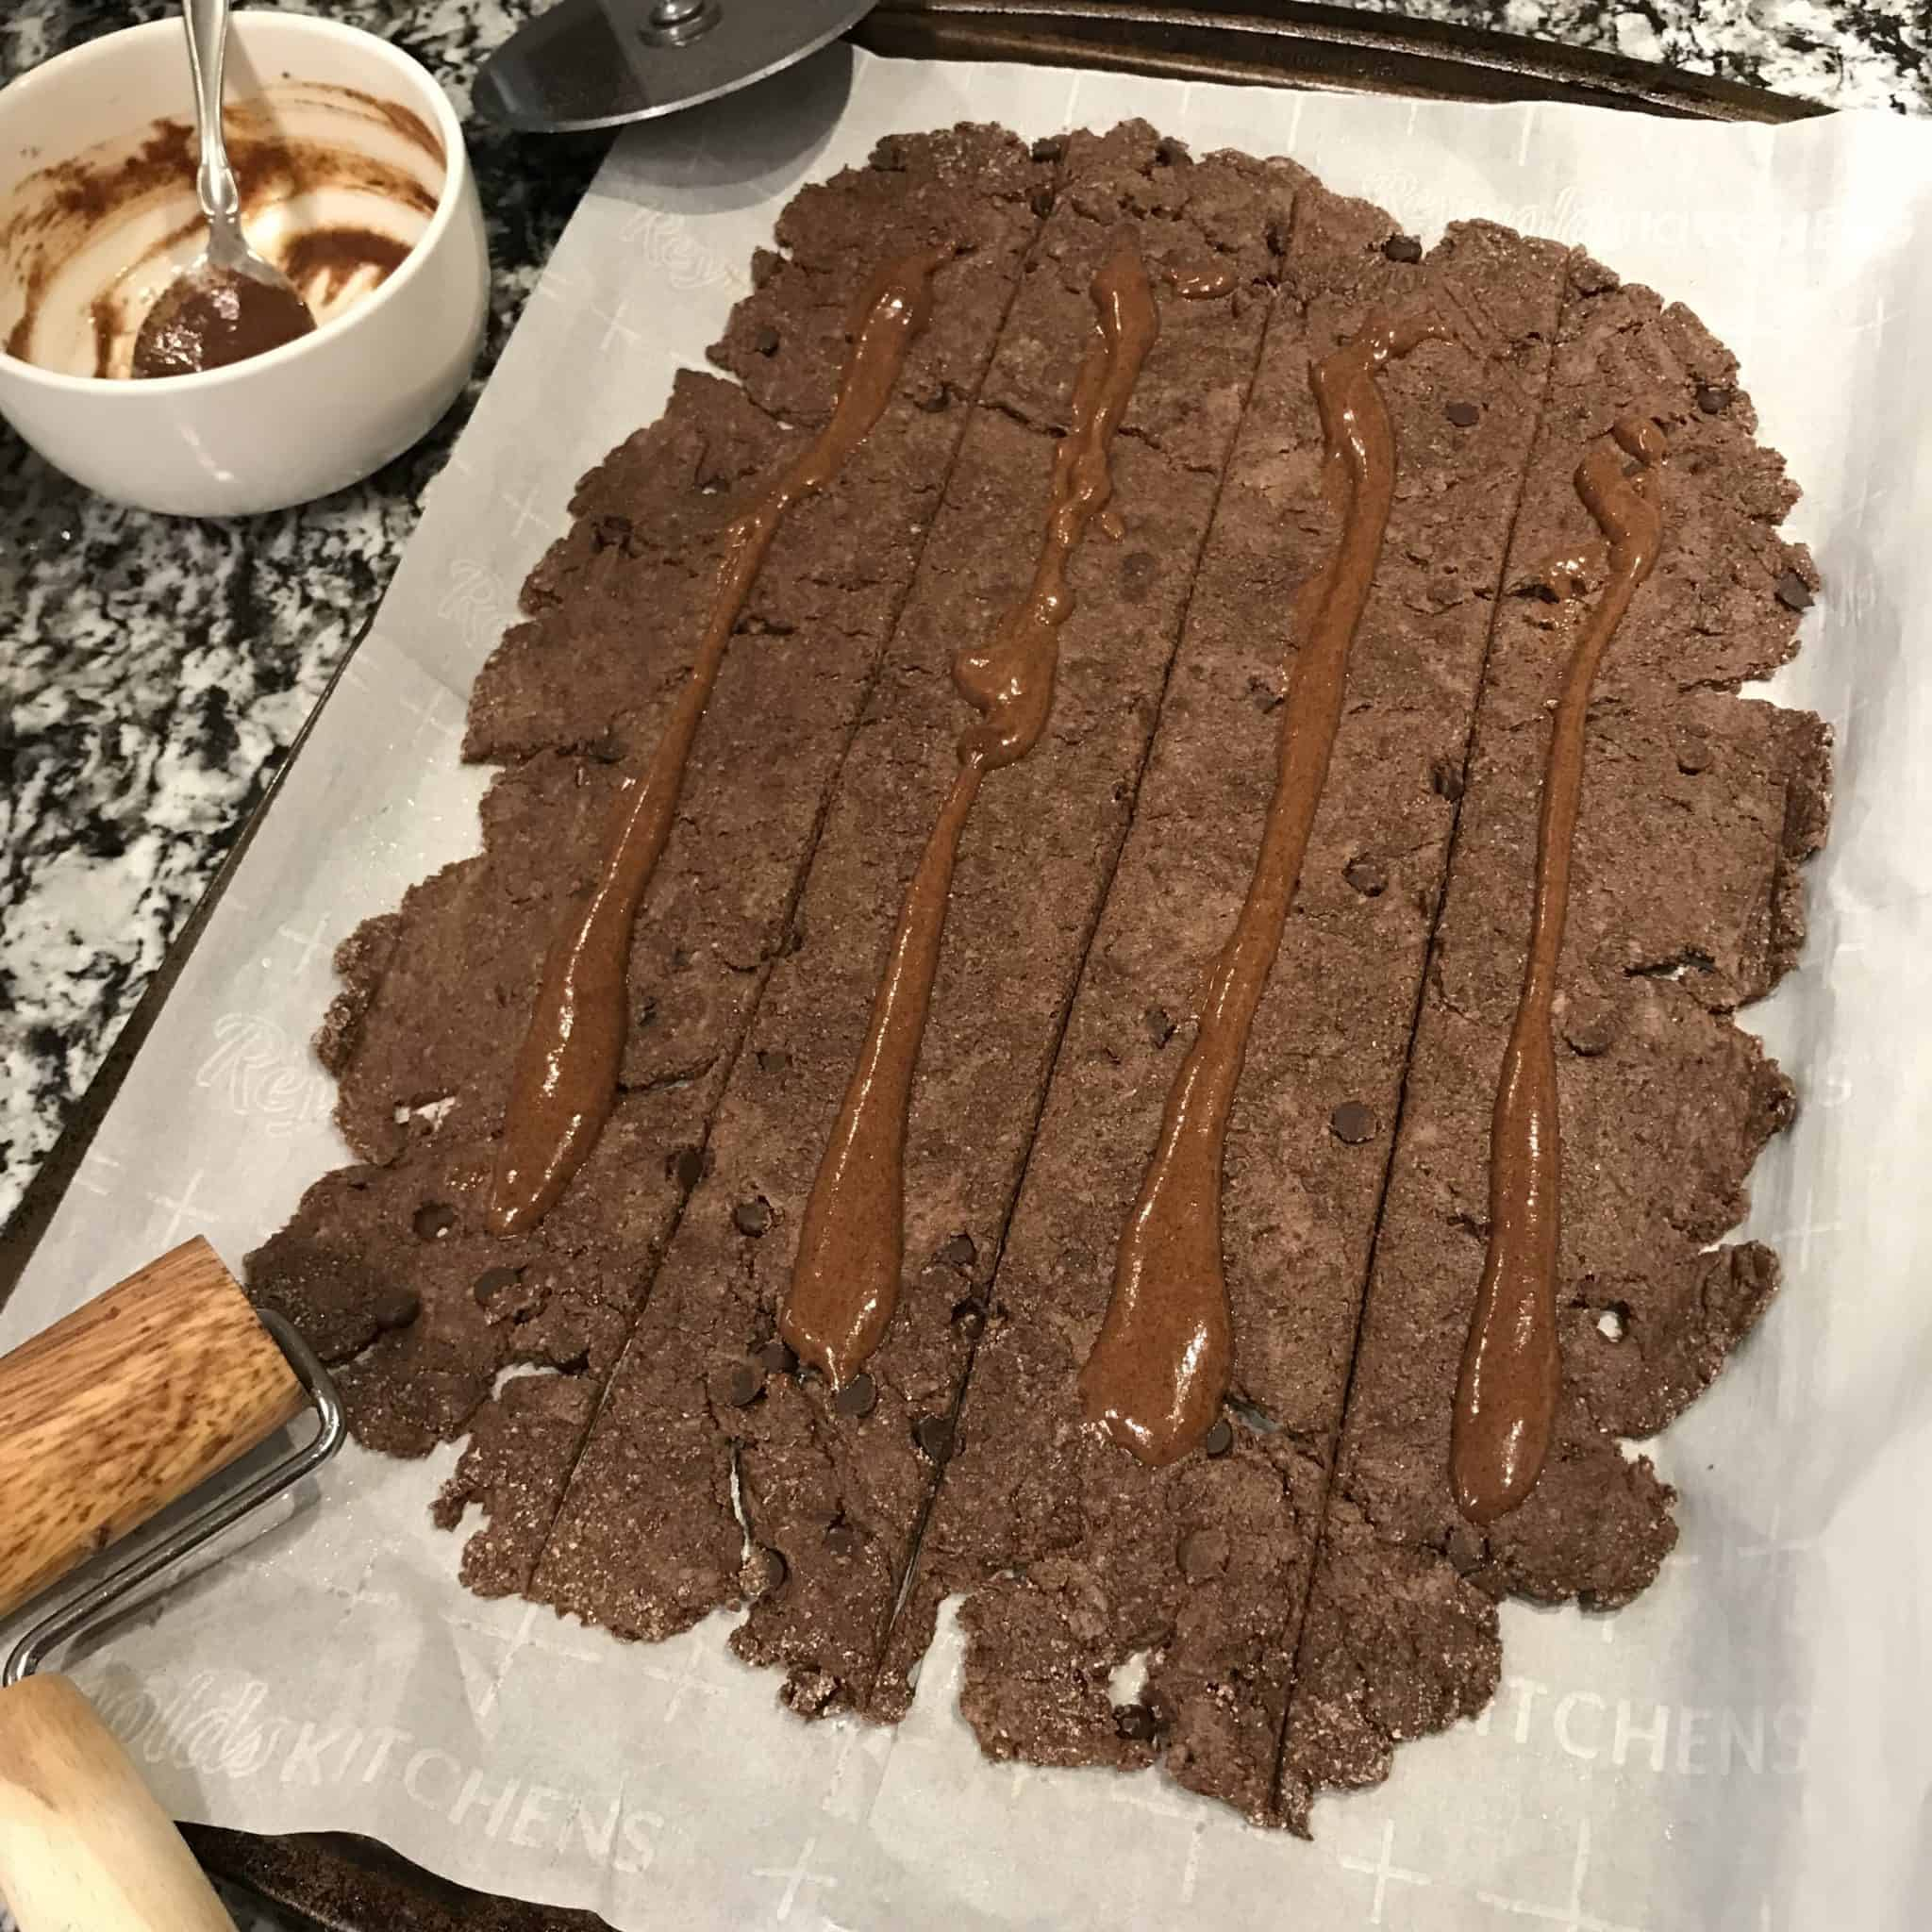 chocolate cinnamon rolls recipe step 3